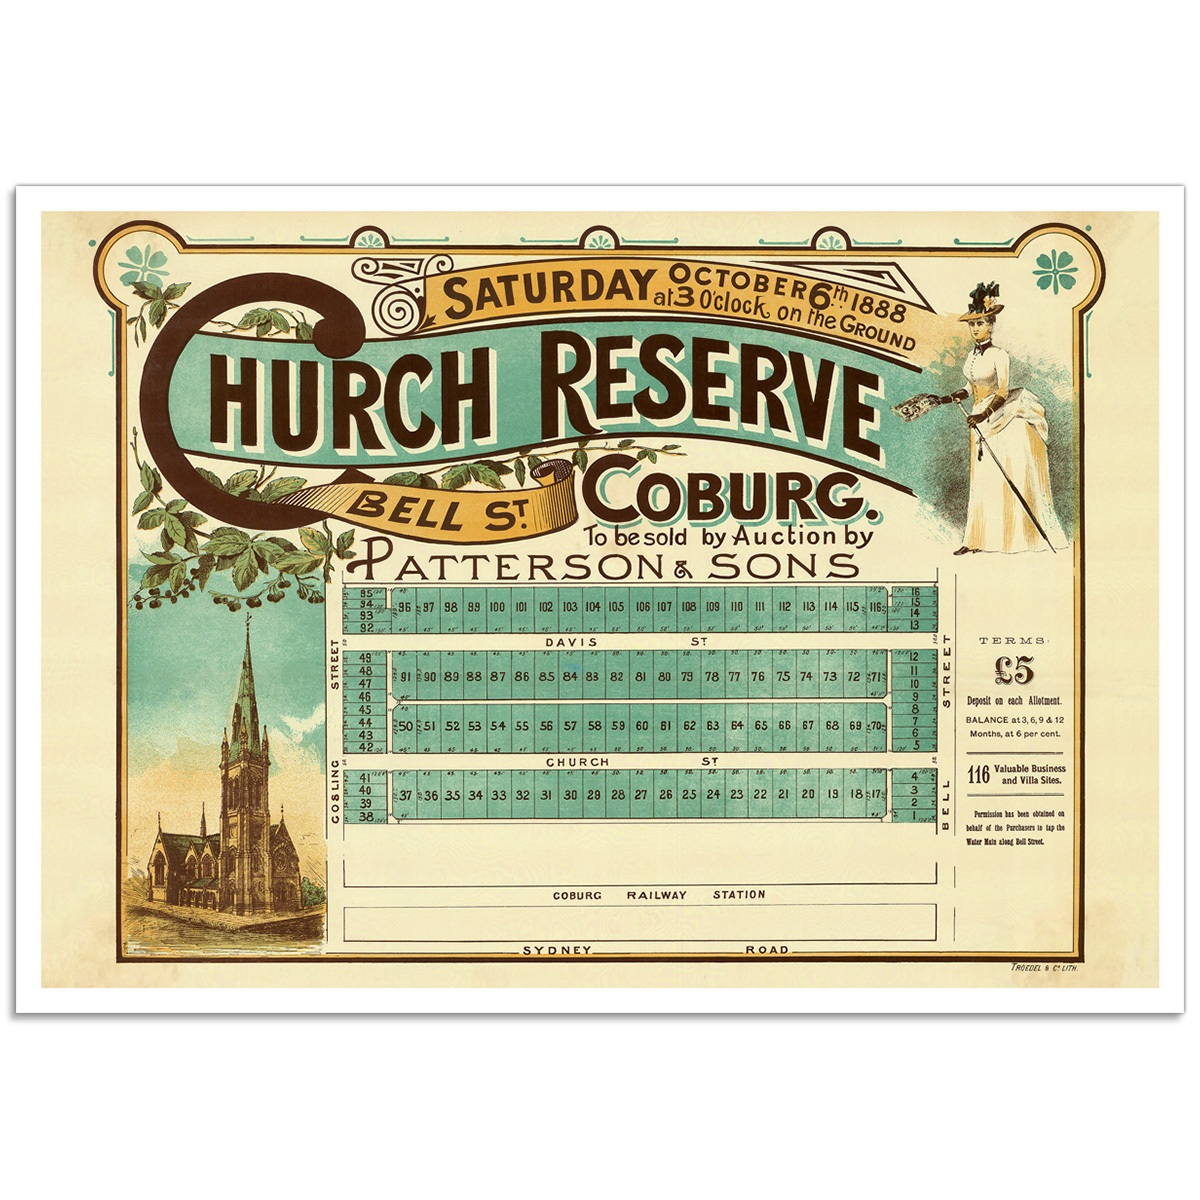 Church Reserve Bell Street, Coburg - Vintage Australian Real Estate Poster